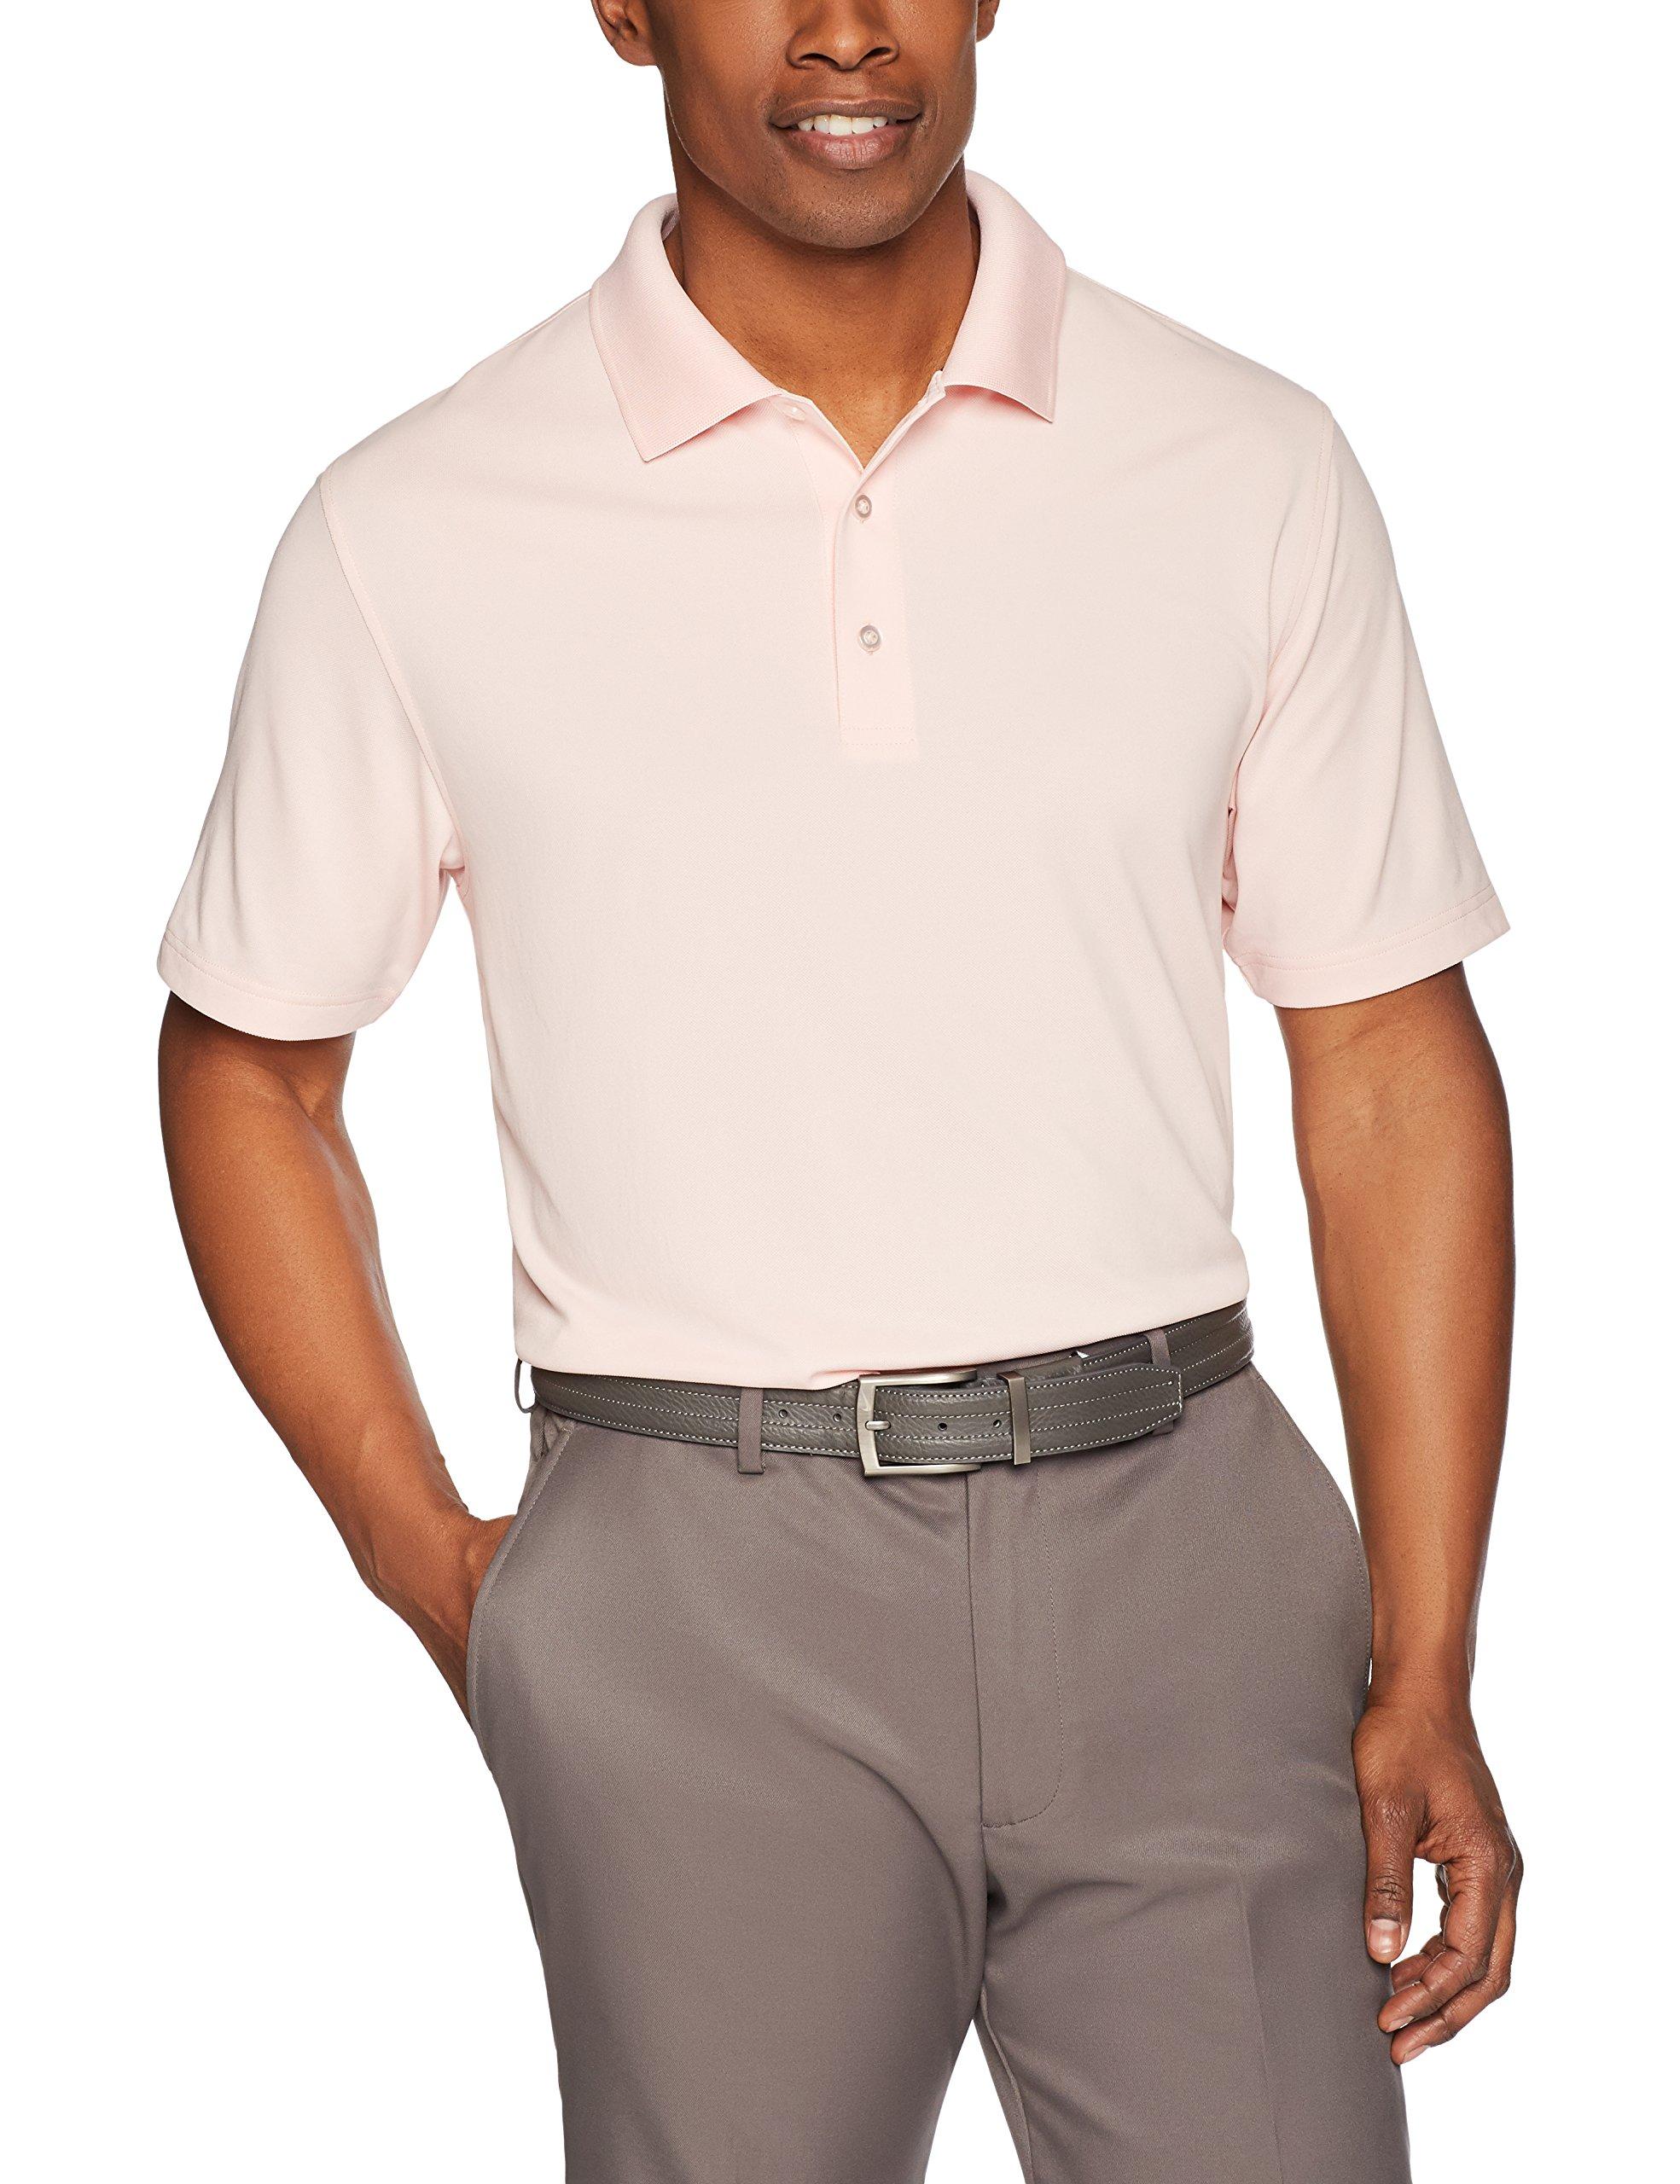 26f0b0692 Mens Pale Pink Polo Shirt - DREAMWORKS